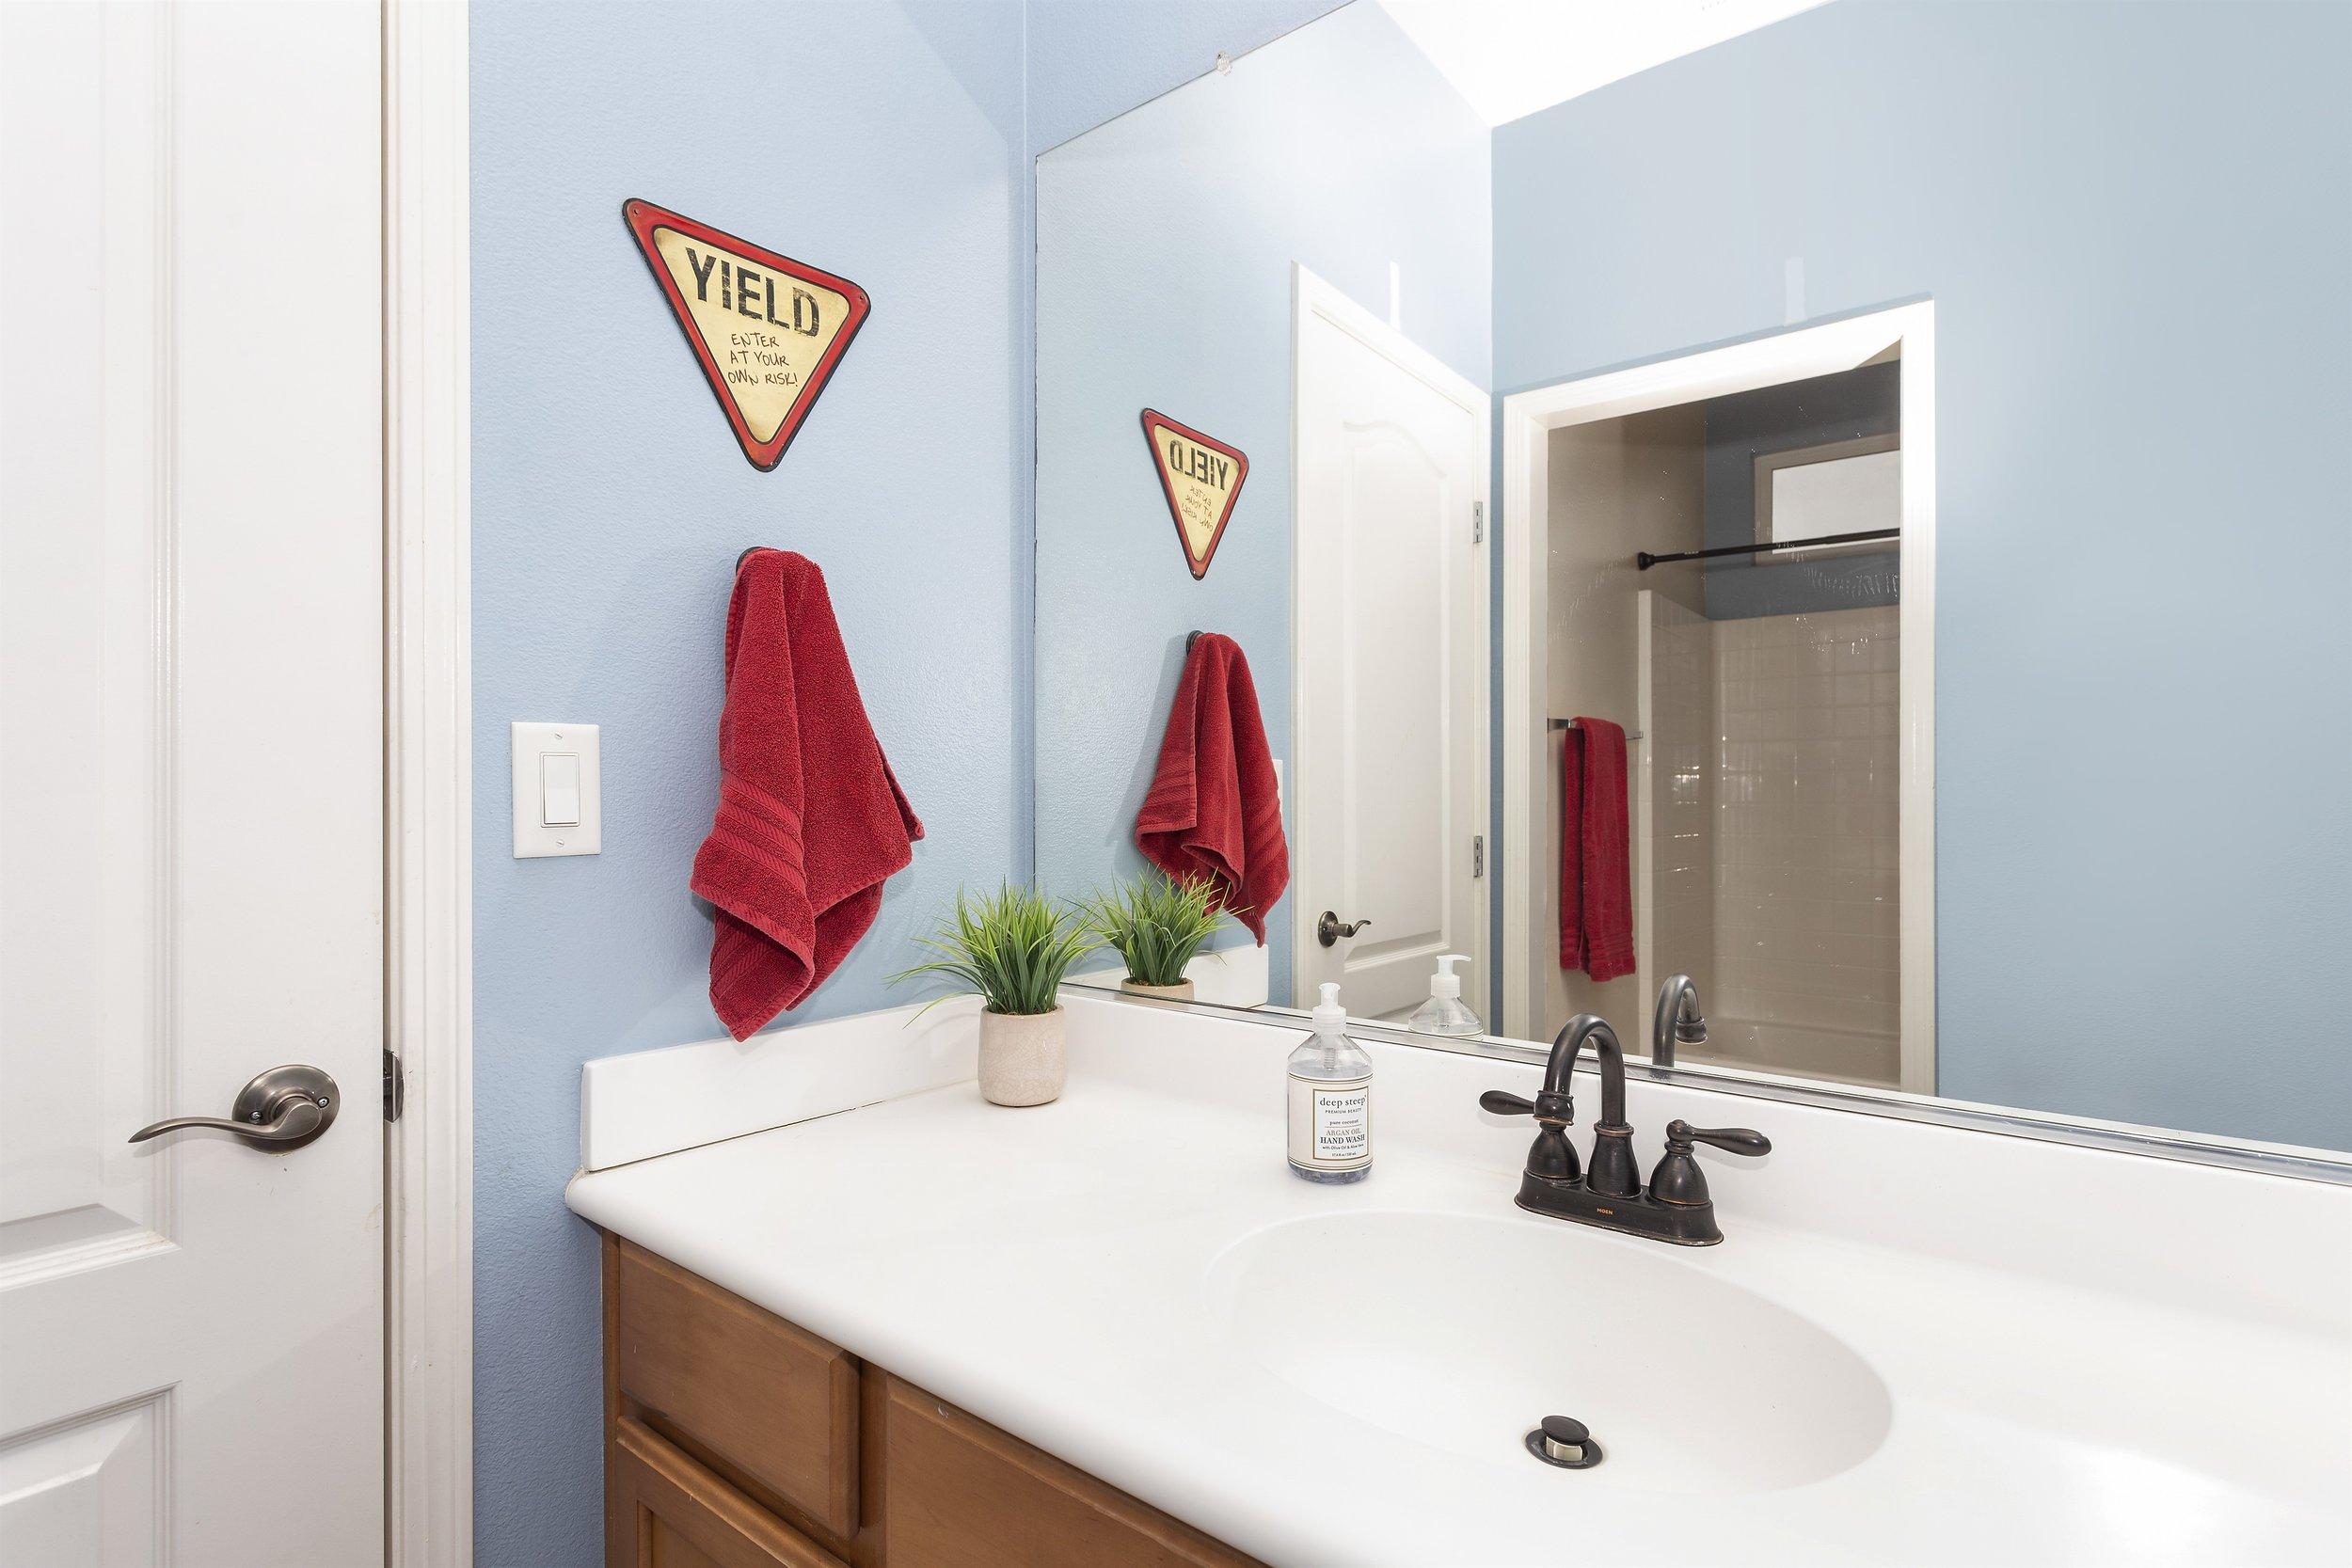 036_2nd Floor Bathroom.jpg